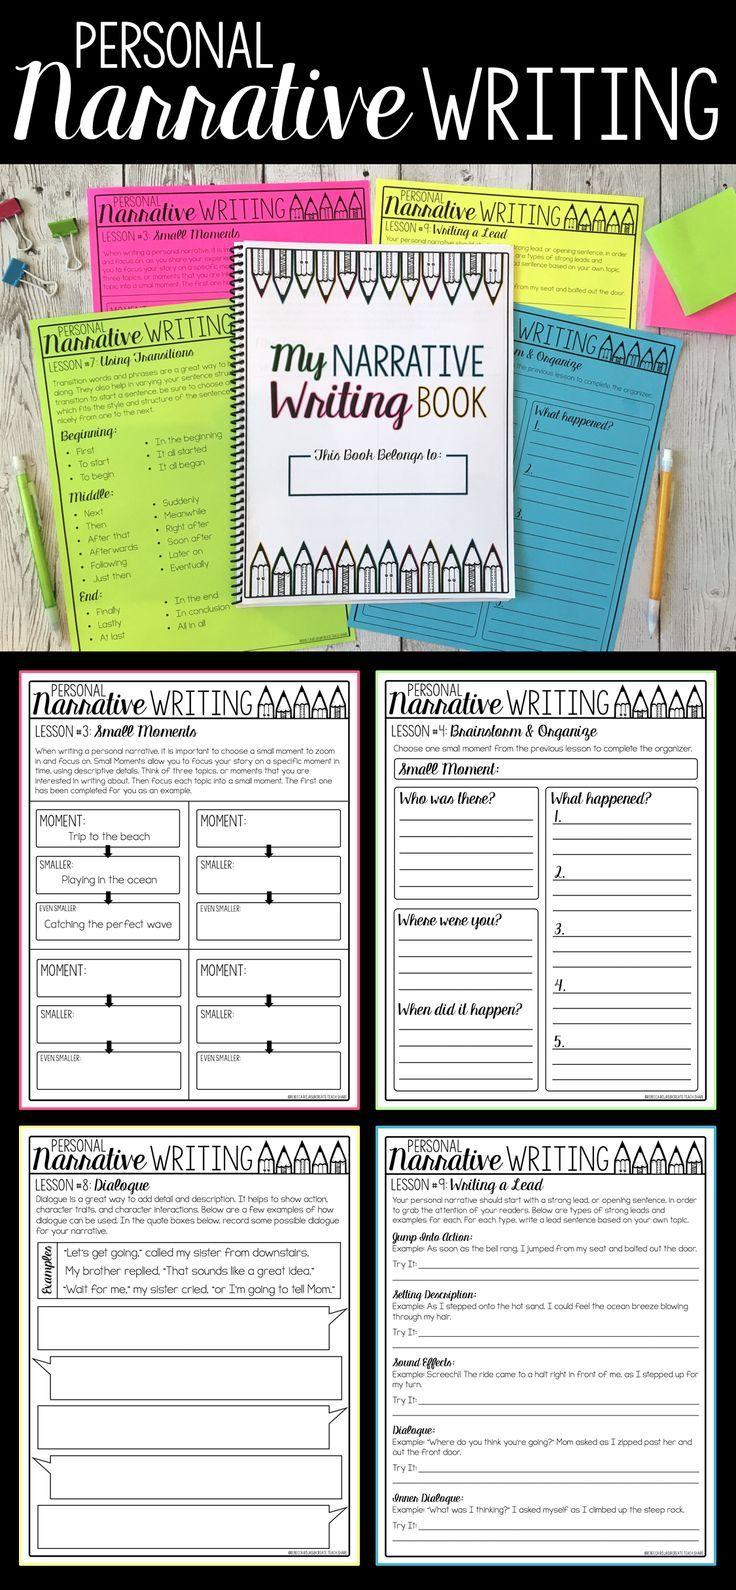 002 Personal Narrative Personal narrative writing, 6th grade